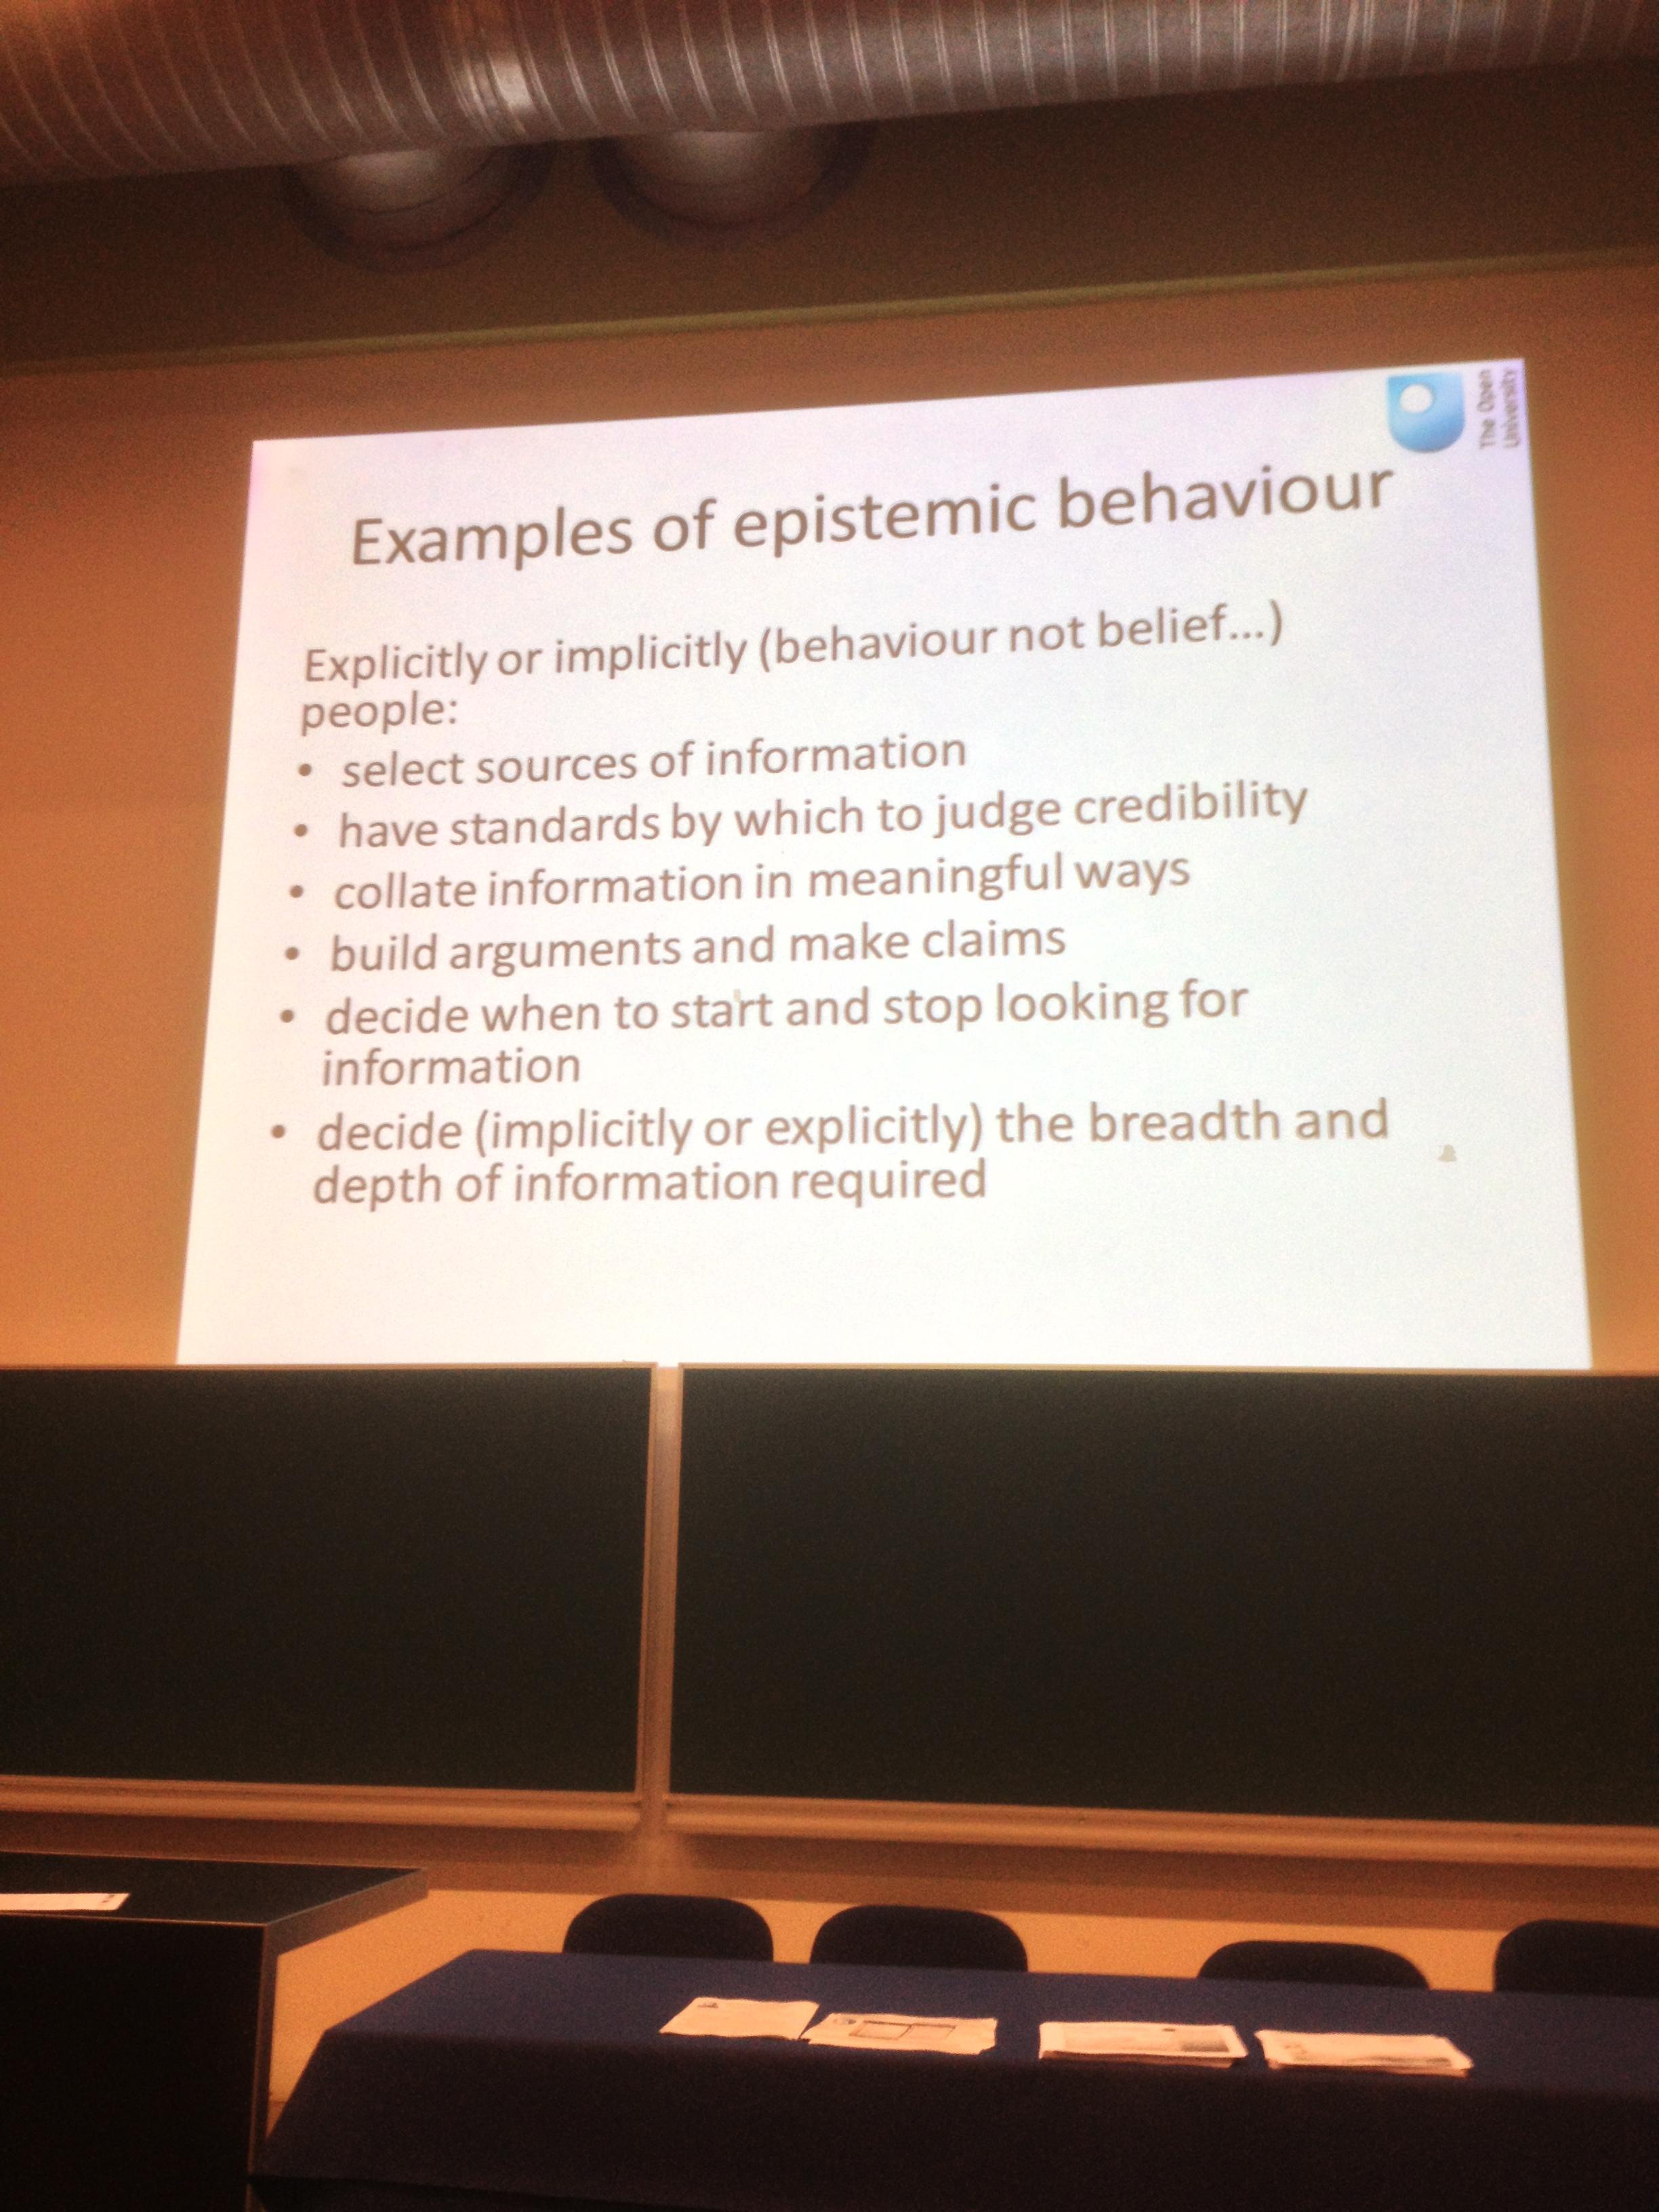 Examples of epistemilogical behaviours